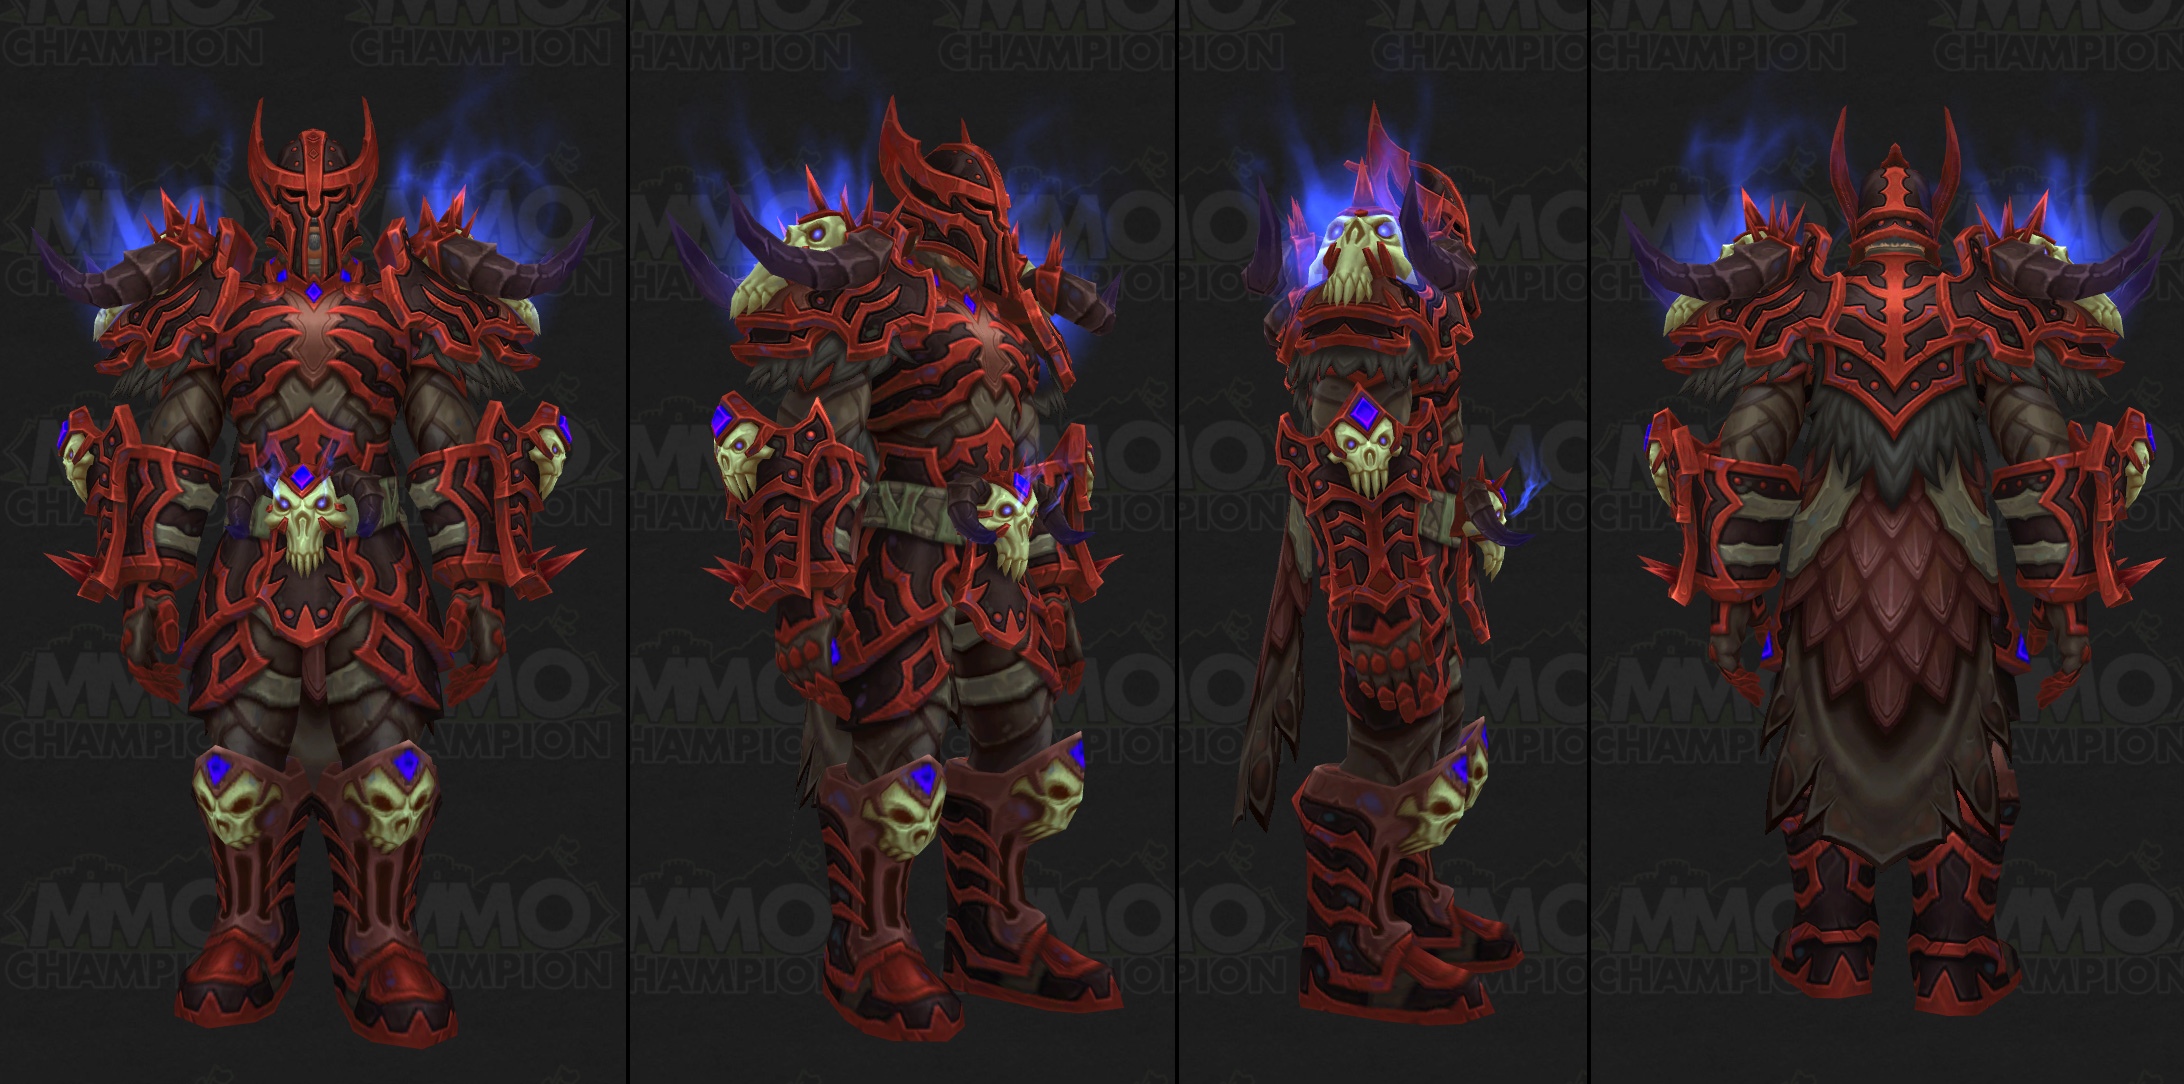 Legion Pvp Season 5 Armor Sets Aug 30 Hotfixes Tweets Art Contest